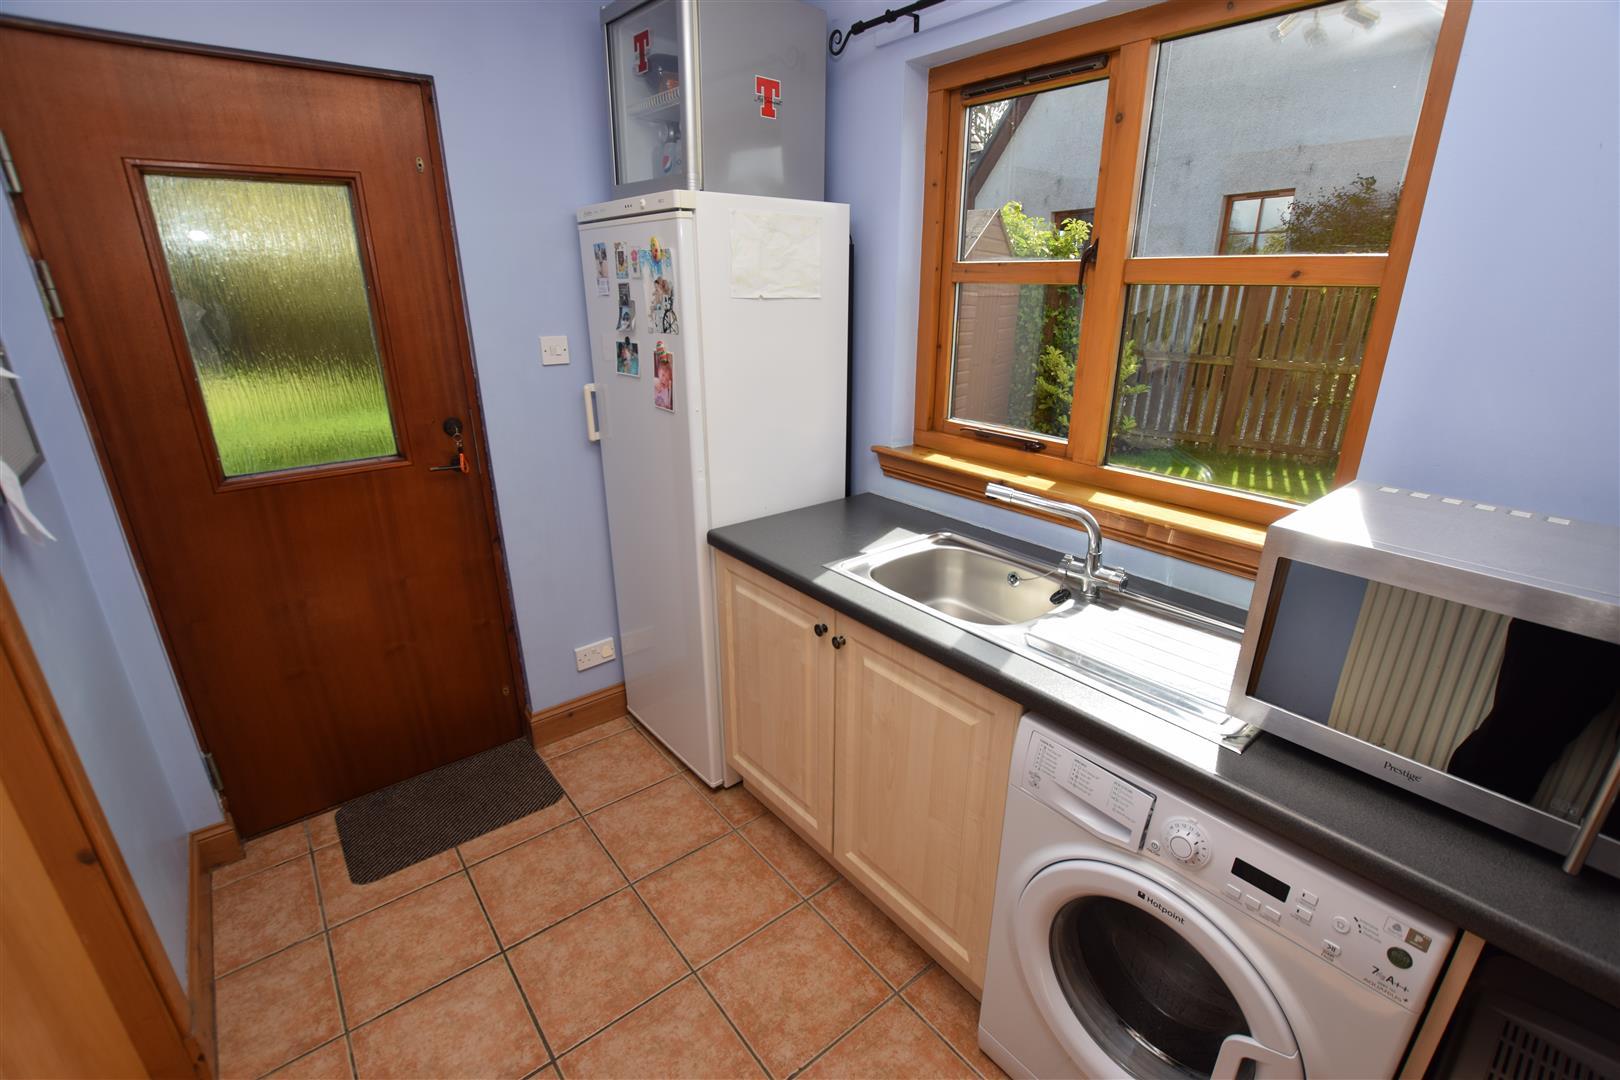 7 Craig Place, Craig Place, Madderty, Perthshire, PH7 3RA, UK